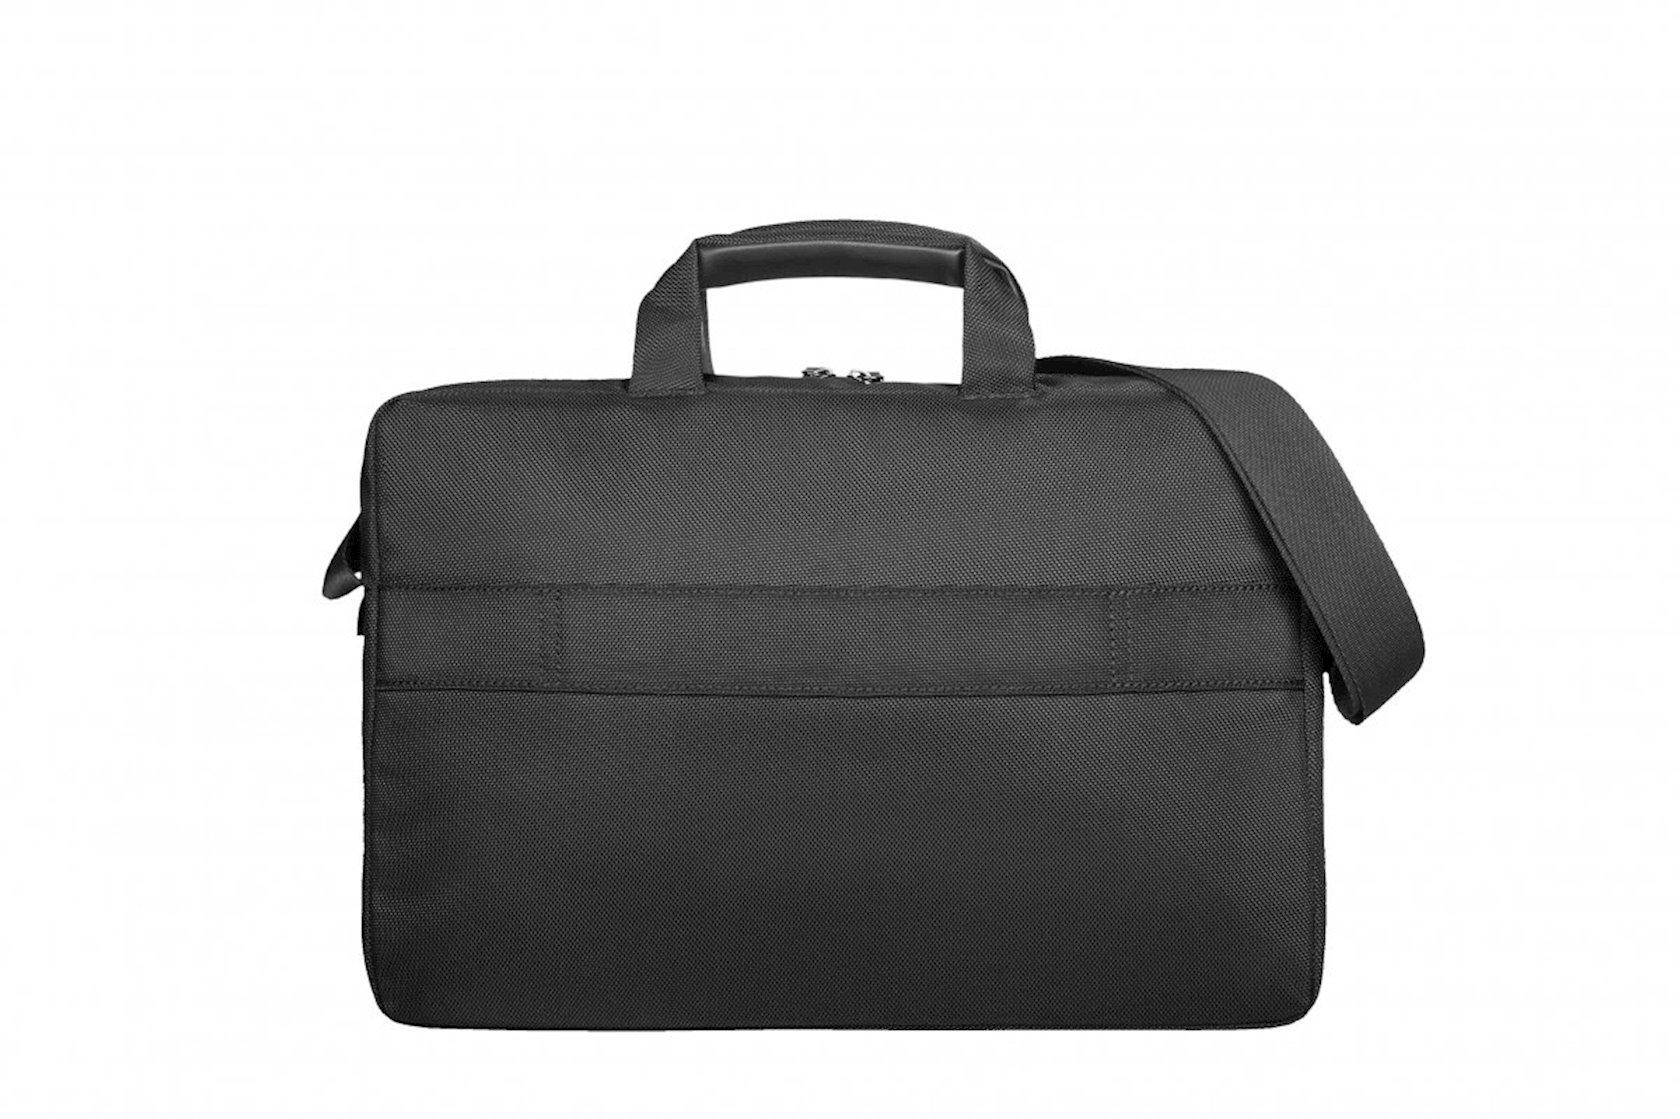 Çanta noutbuk üçün Tucano Free&Busy 14 & MB Pro15, qara